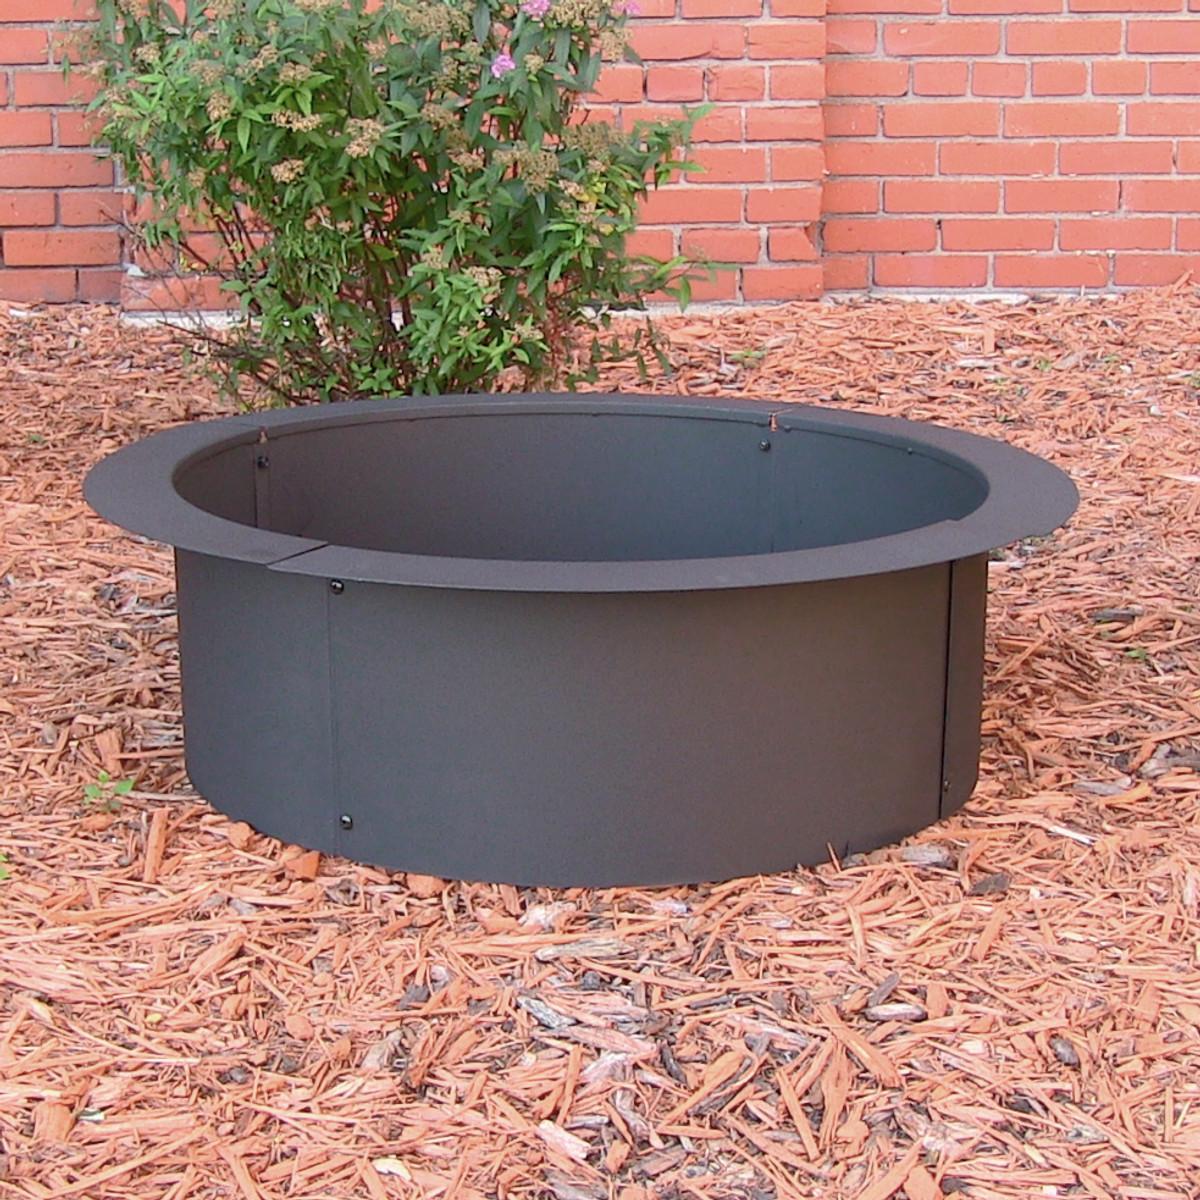 Sunnydaze Durable Steel Fire Pit Ring Liner Diy Fire Pit Rim Above Or In Ground In Ground Fire Pit Wood Fire Pit Fire Pit Liner